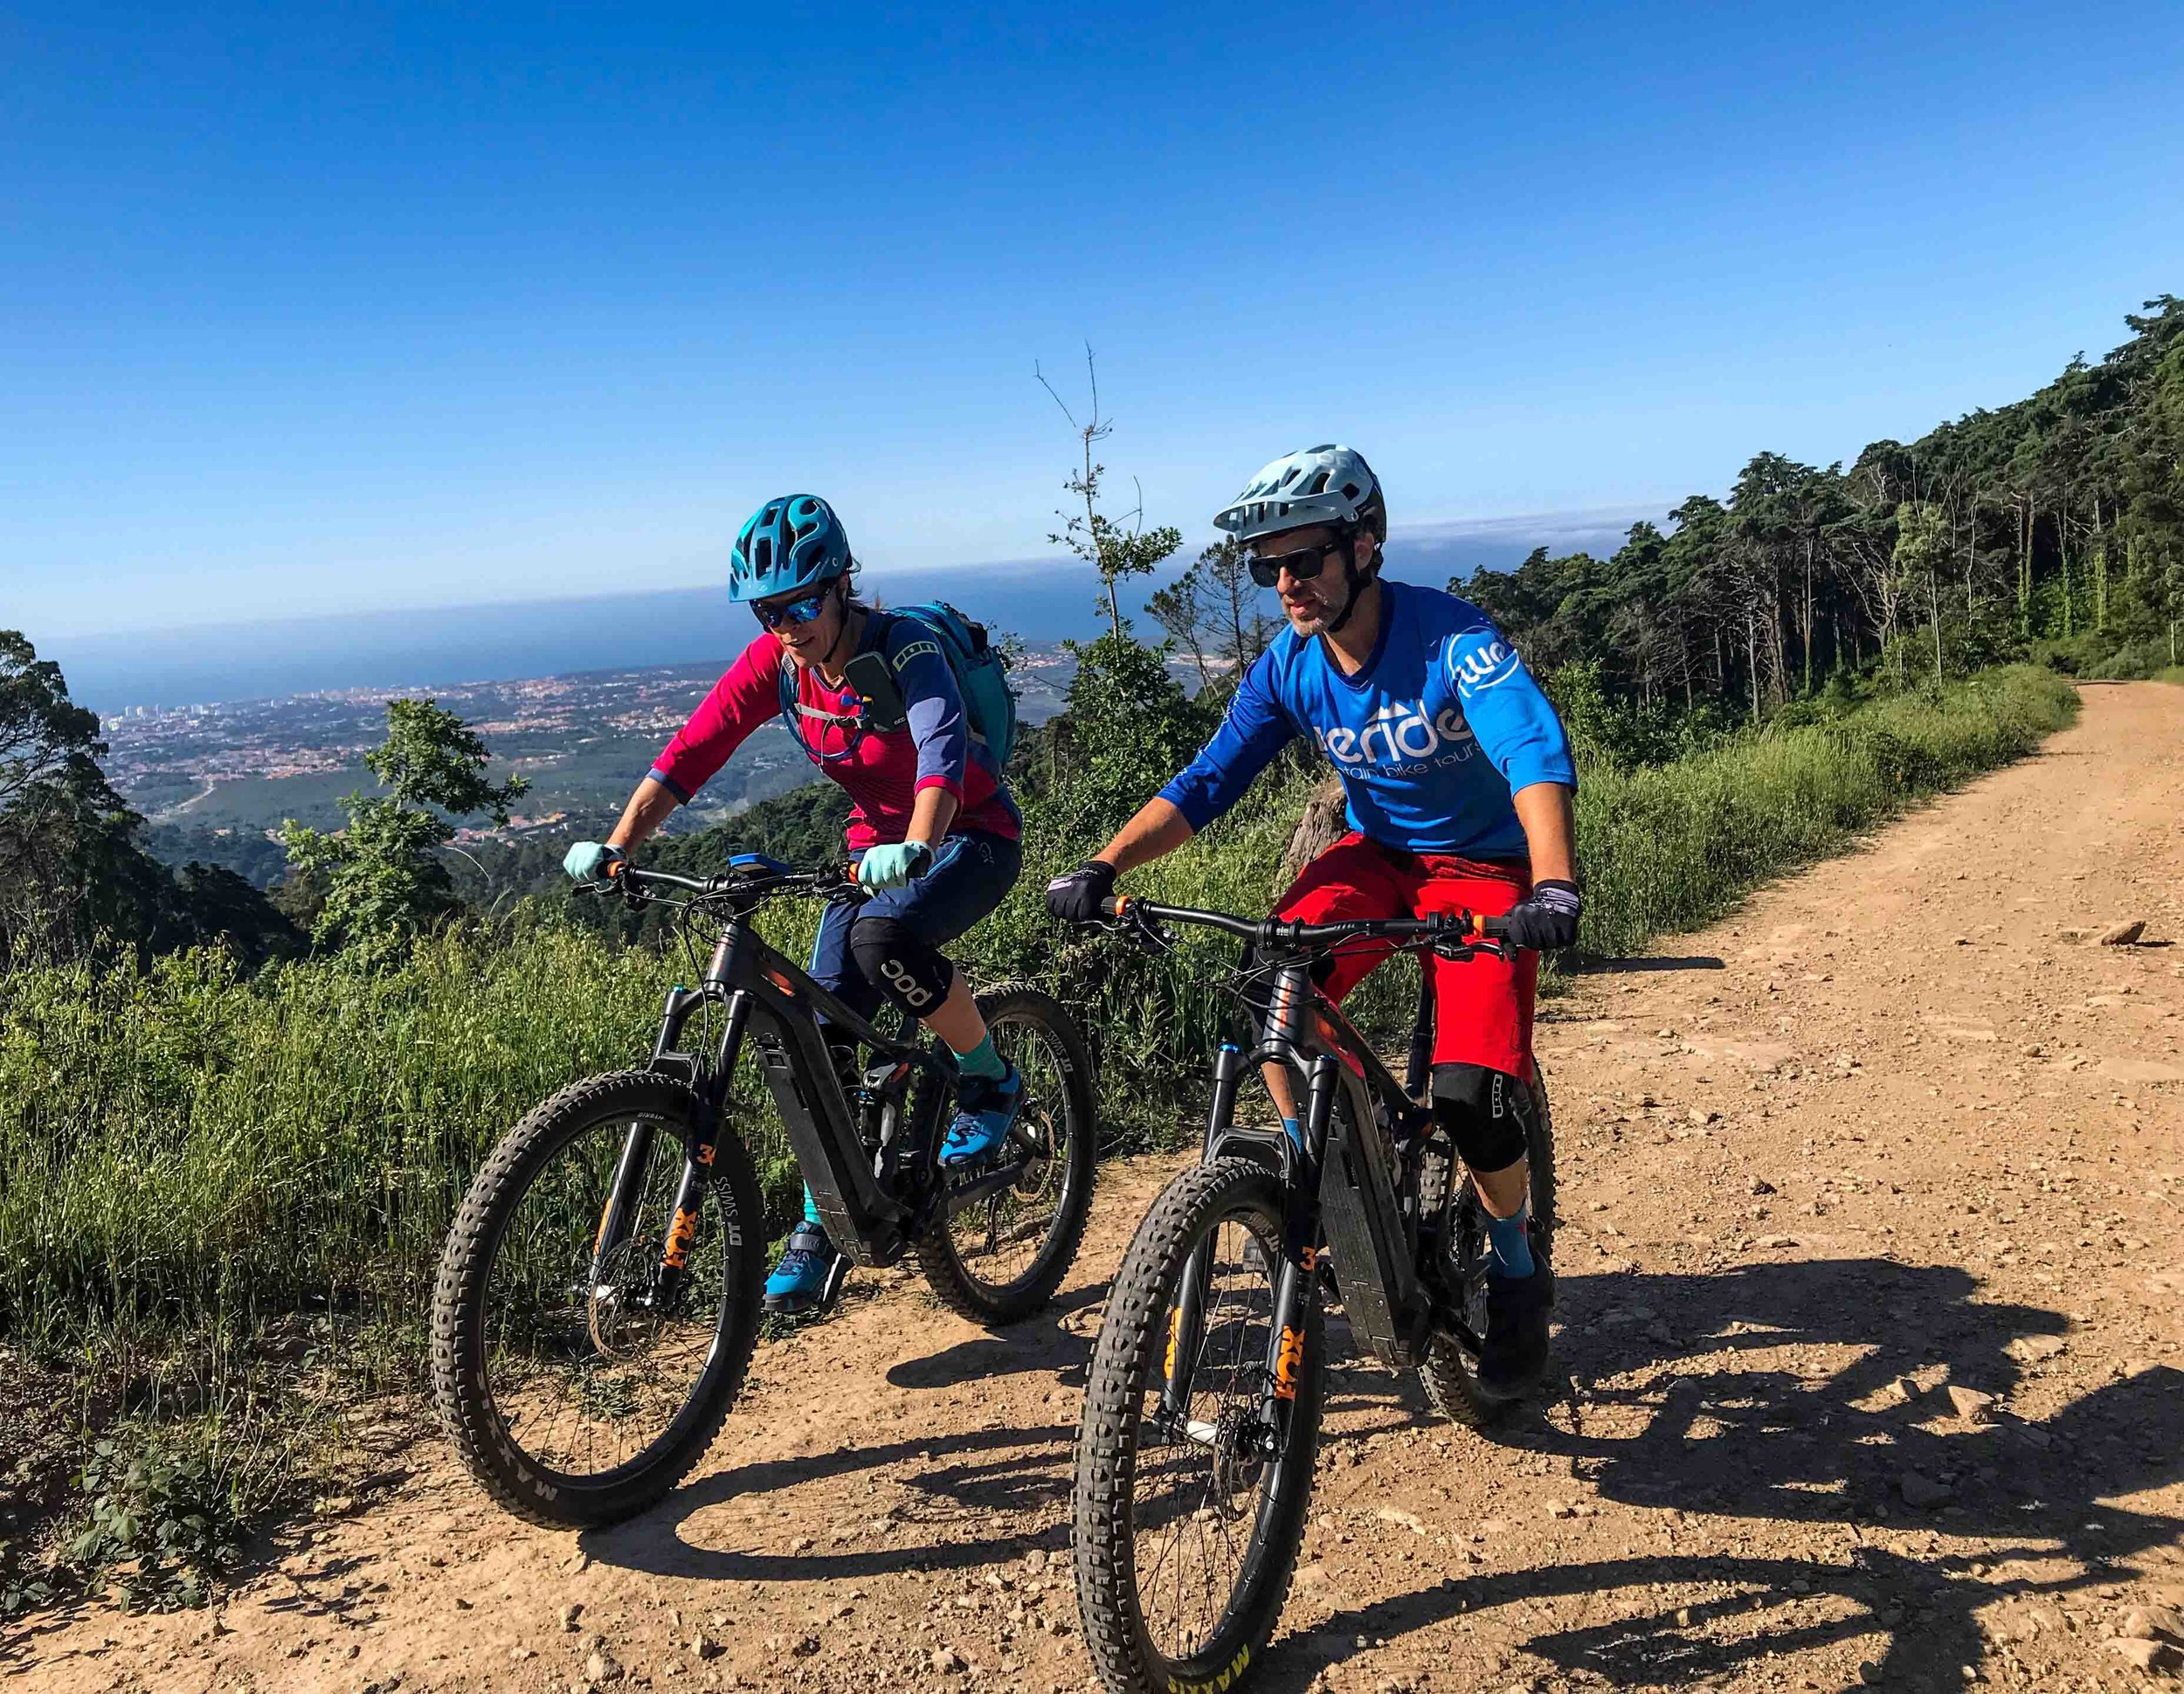 2019-05-15-electric-scouting-tour-tatiana-broman_47894969101_o.jpg